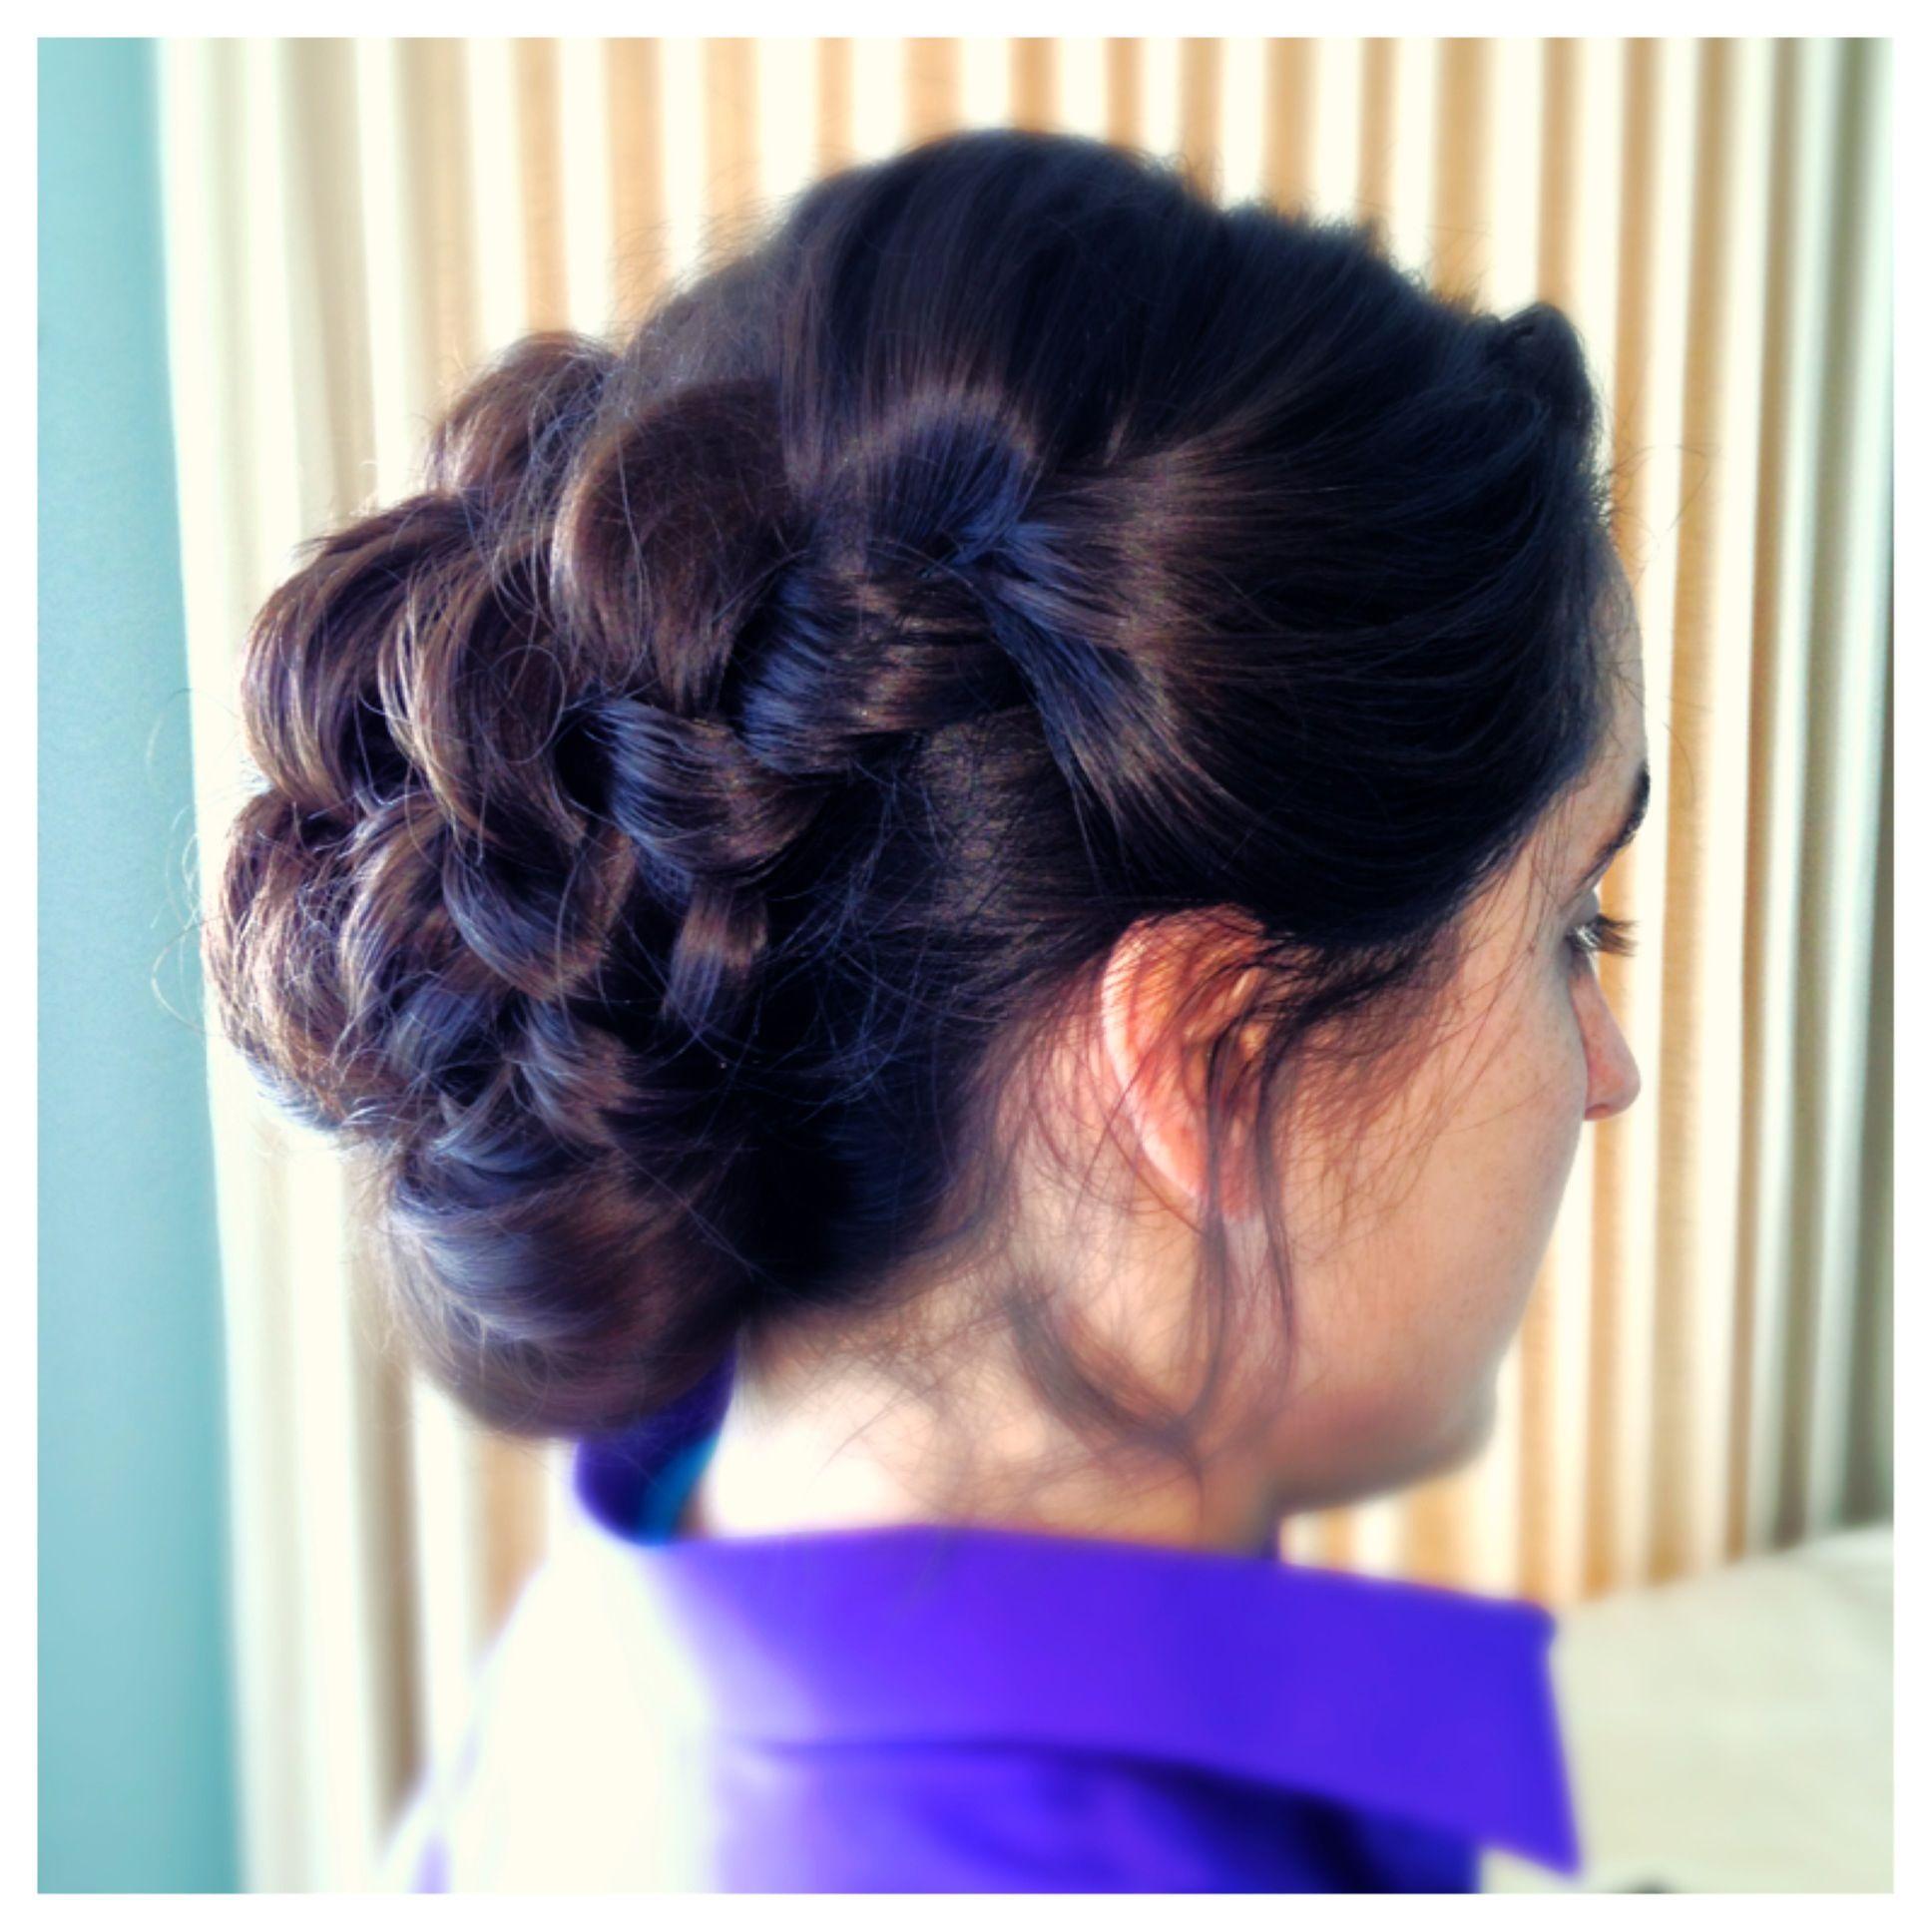 bridal bridesmaid wedding hair updo by jillian jensen makeup